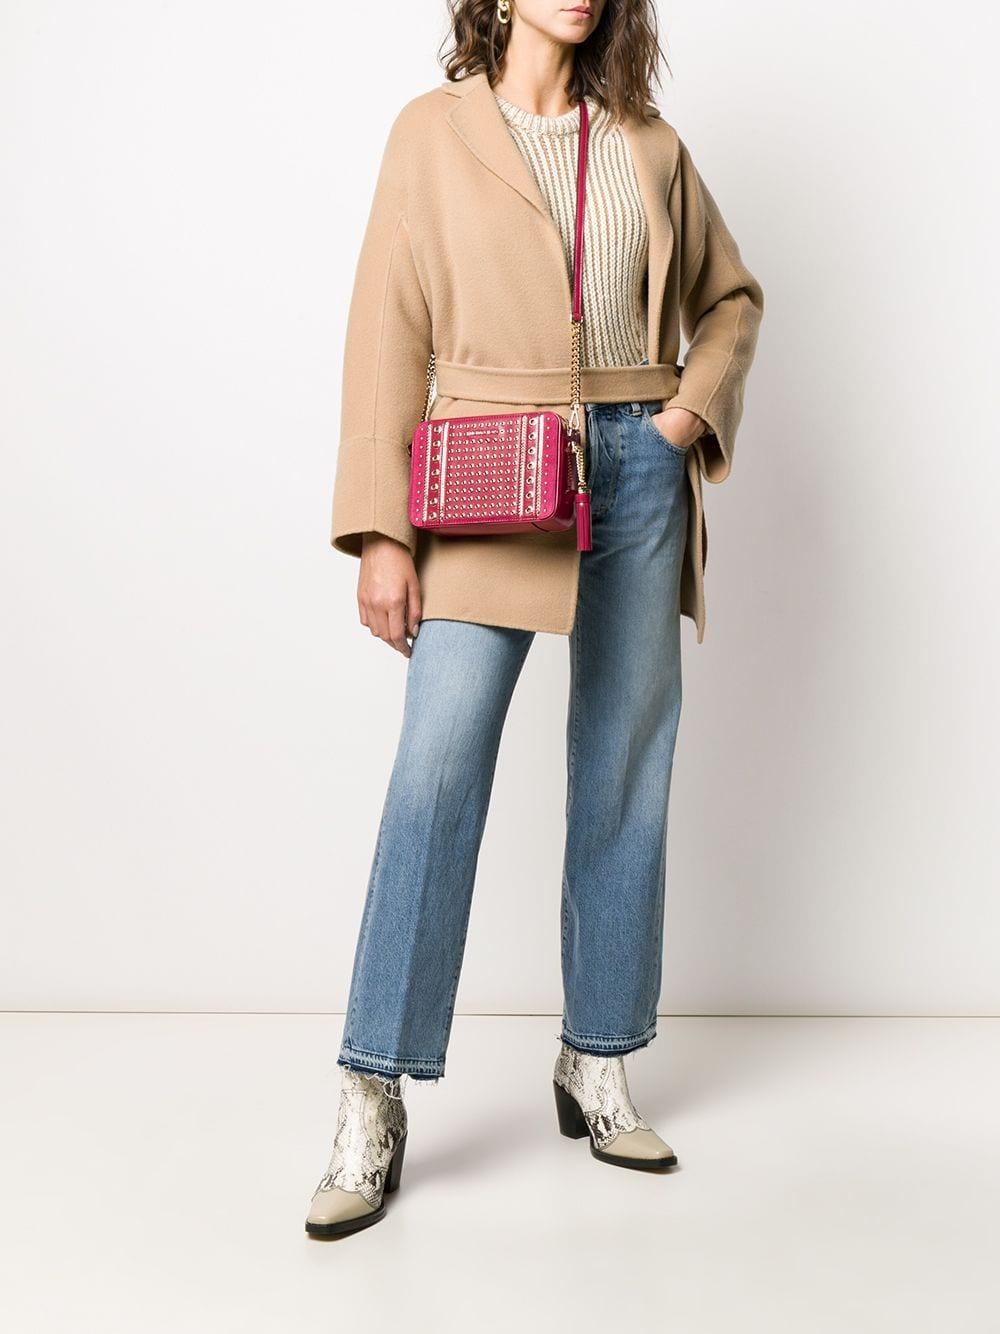 GOLDEN GOOSE DELUXE BRAND Jeans GOLDEN GOOSE | Jeans | G36WP0D1A1